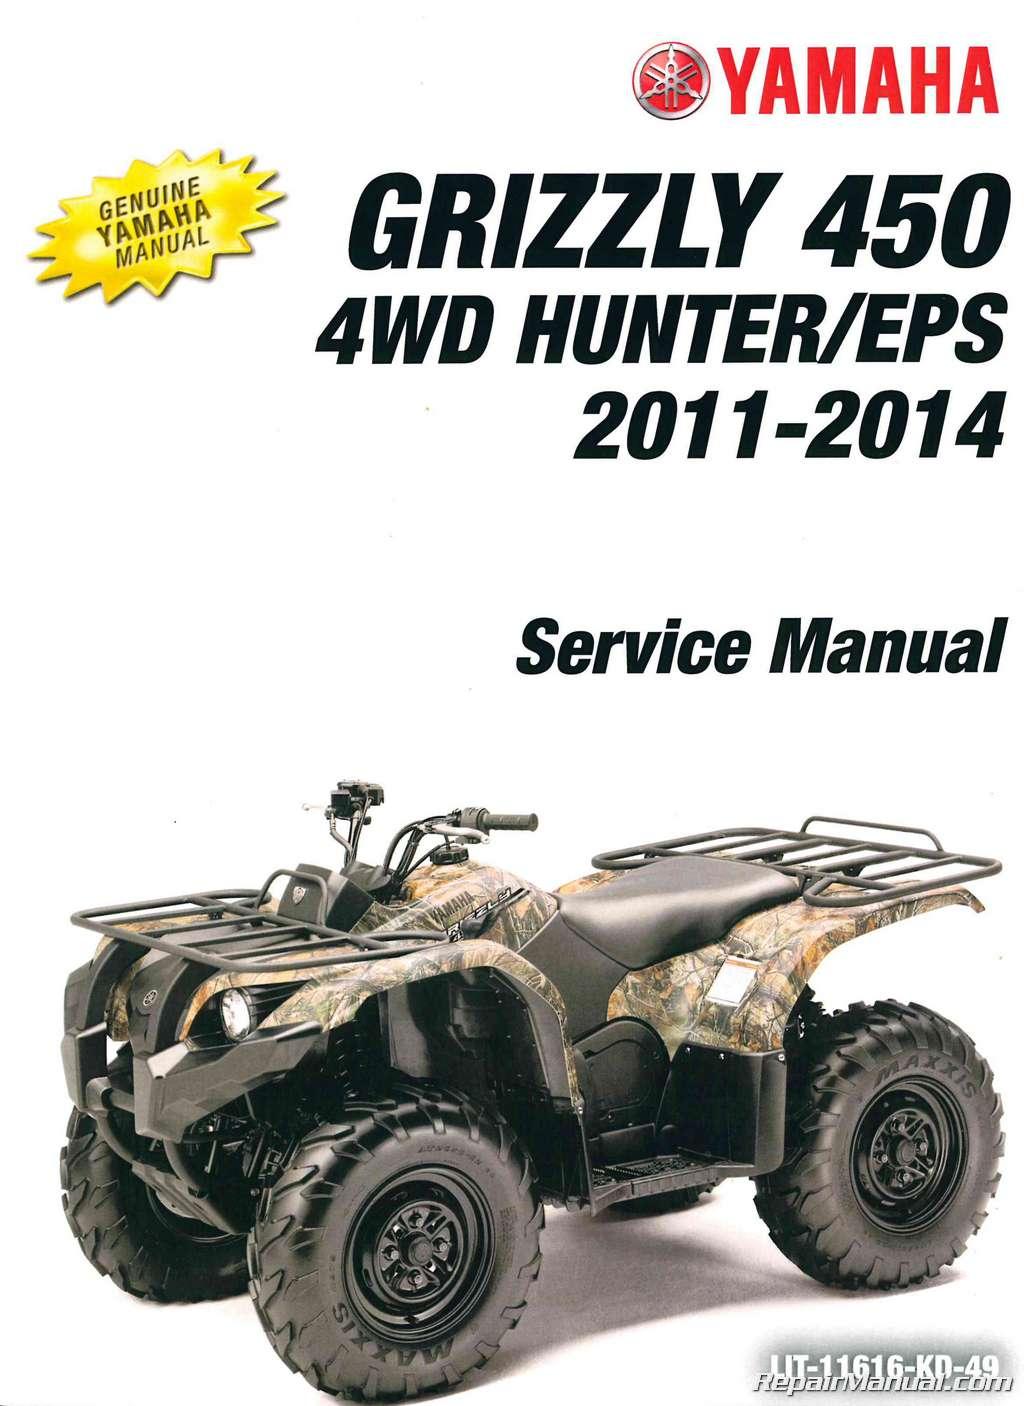 hight resolution of 2003 2006 yamaha kodiak 450 4wd 2007 2014 grizzly 450 4wd service manual